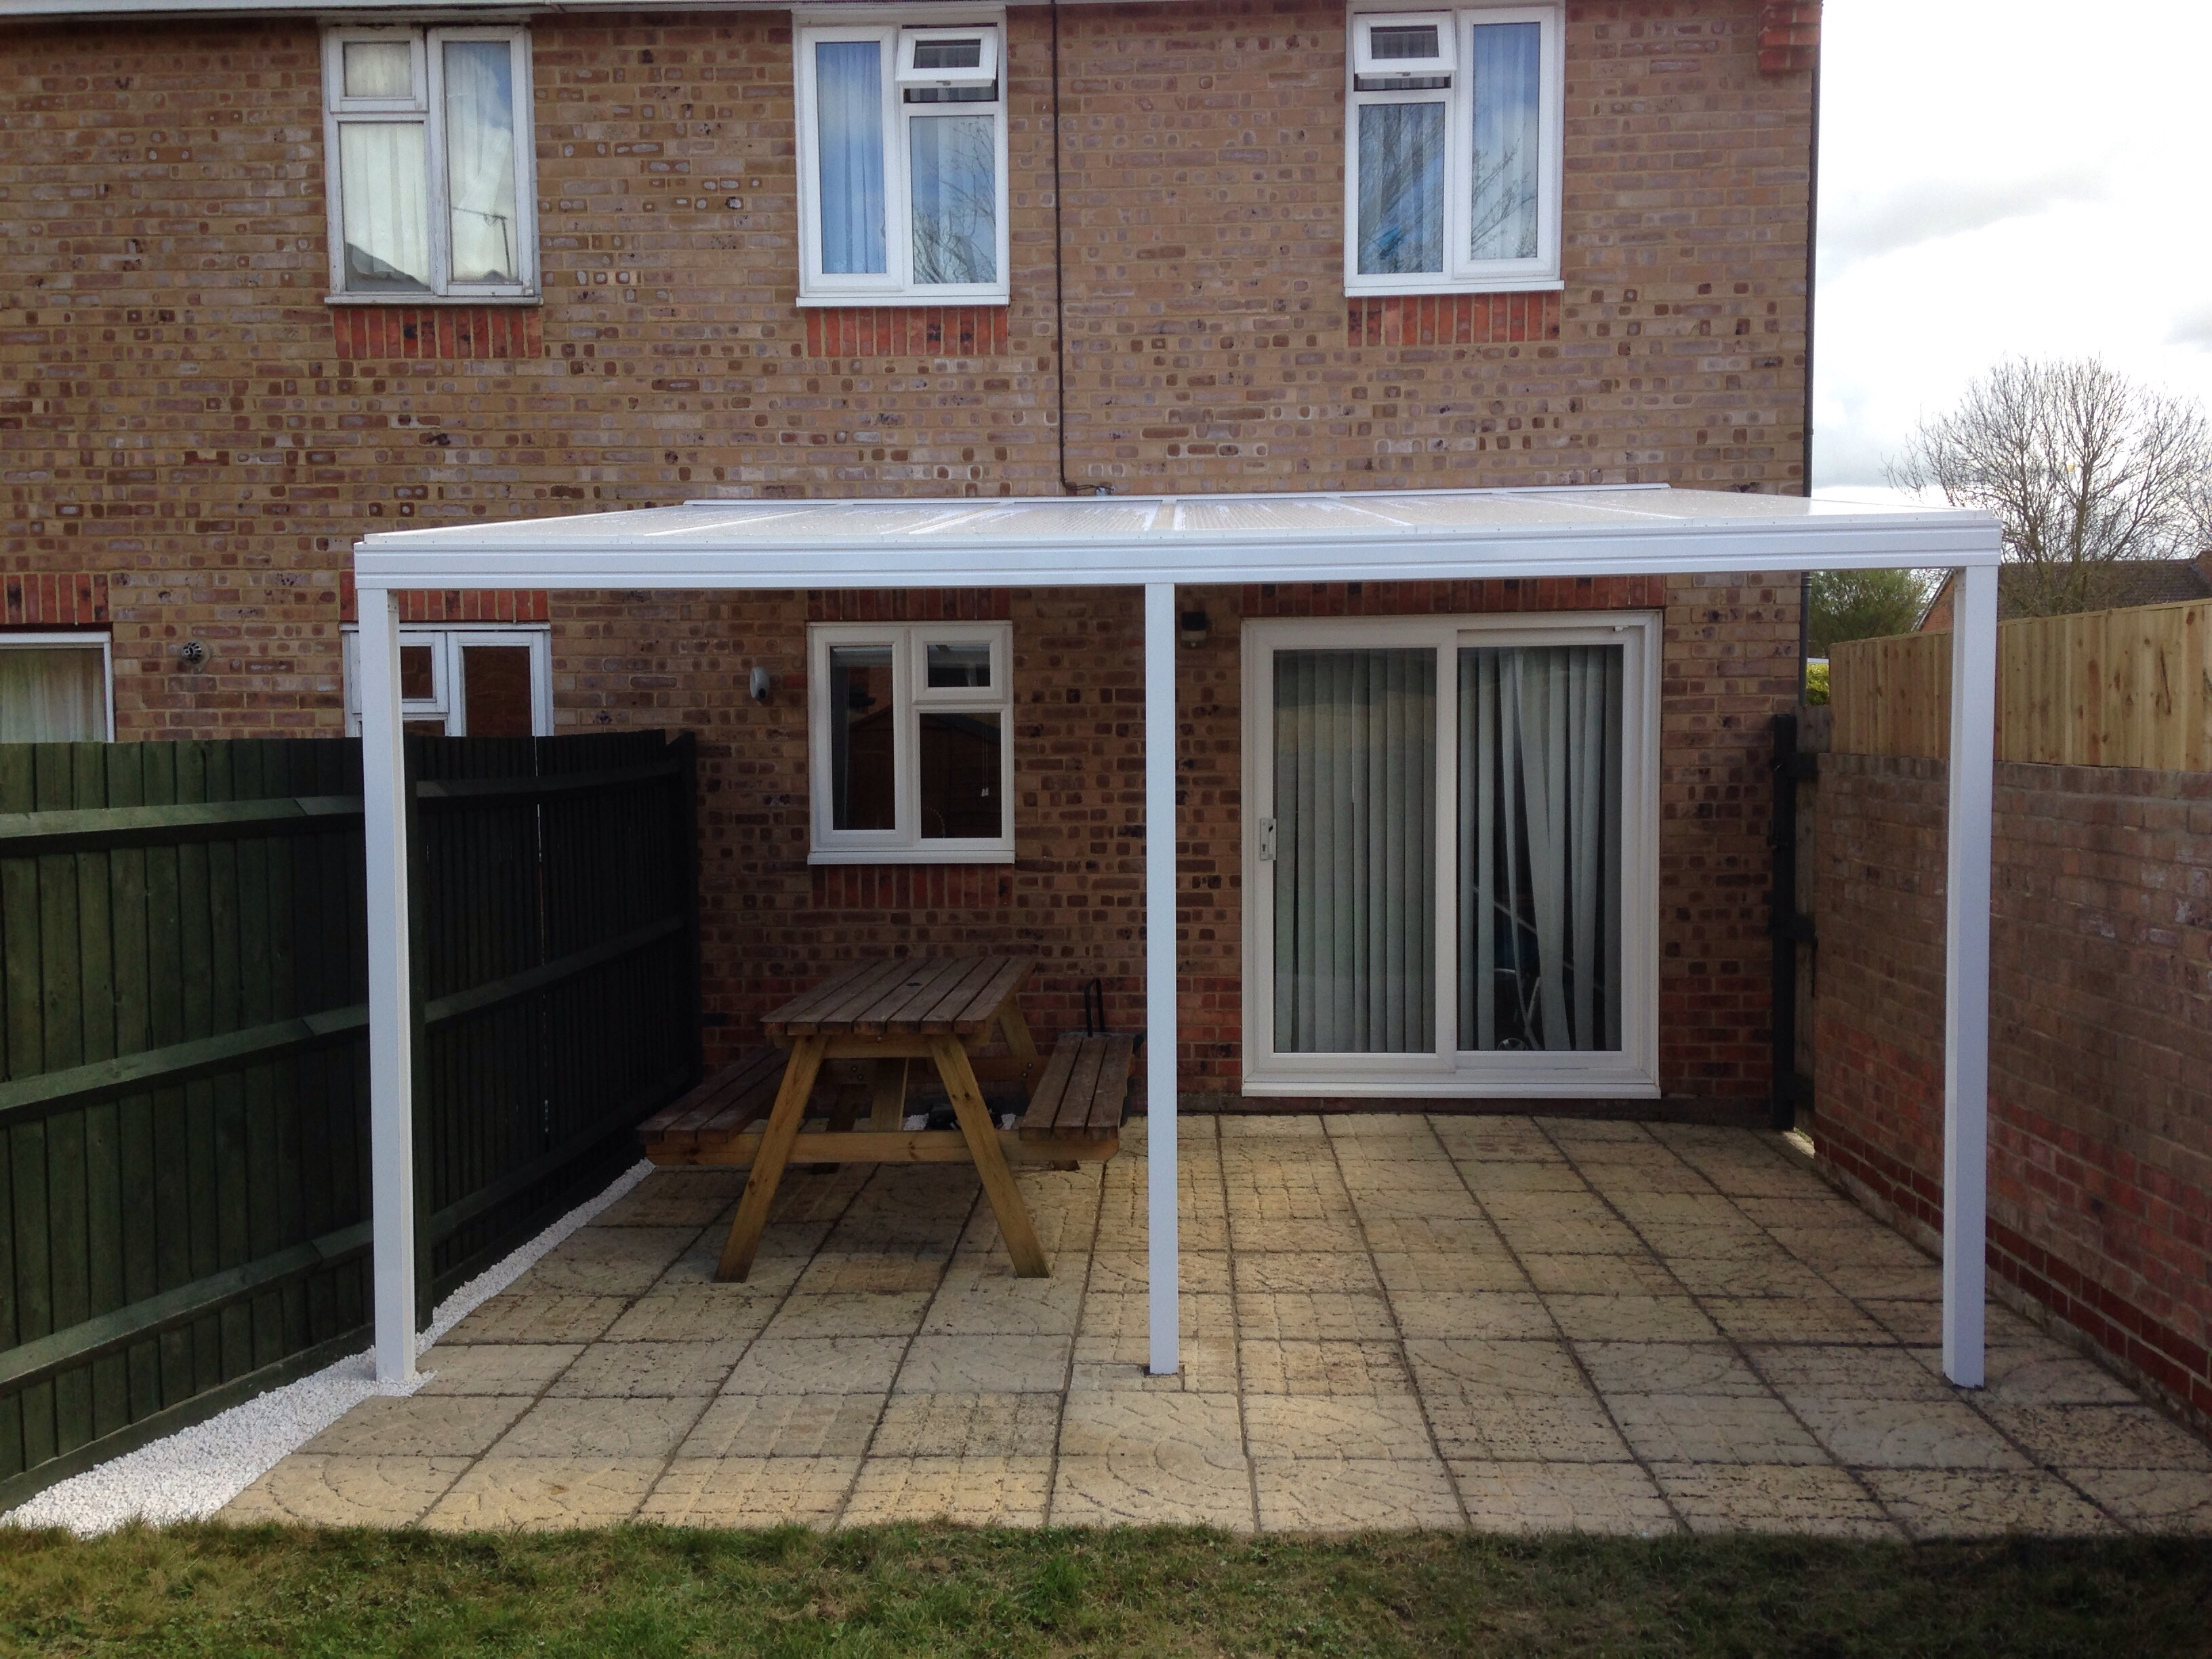 Wallingford garden canopy, Wallingford patio, Wallingford garden ideas